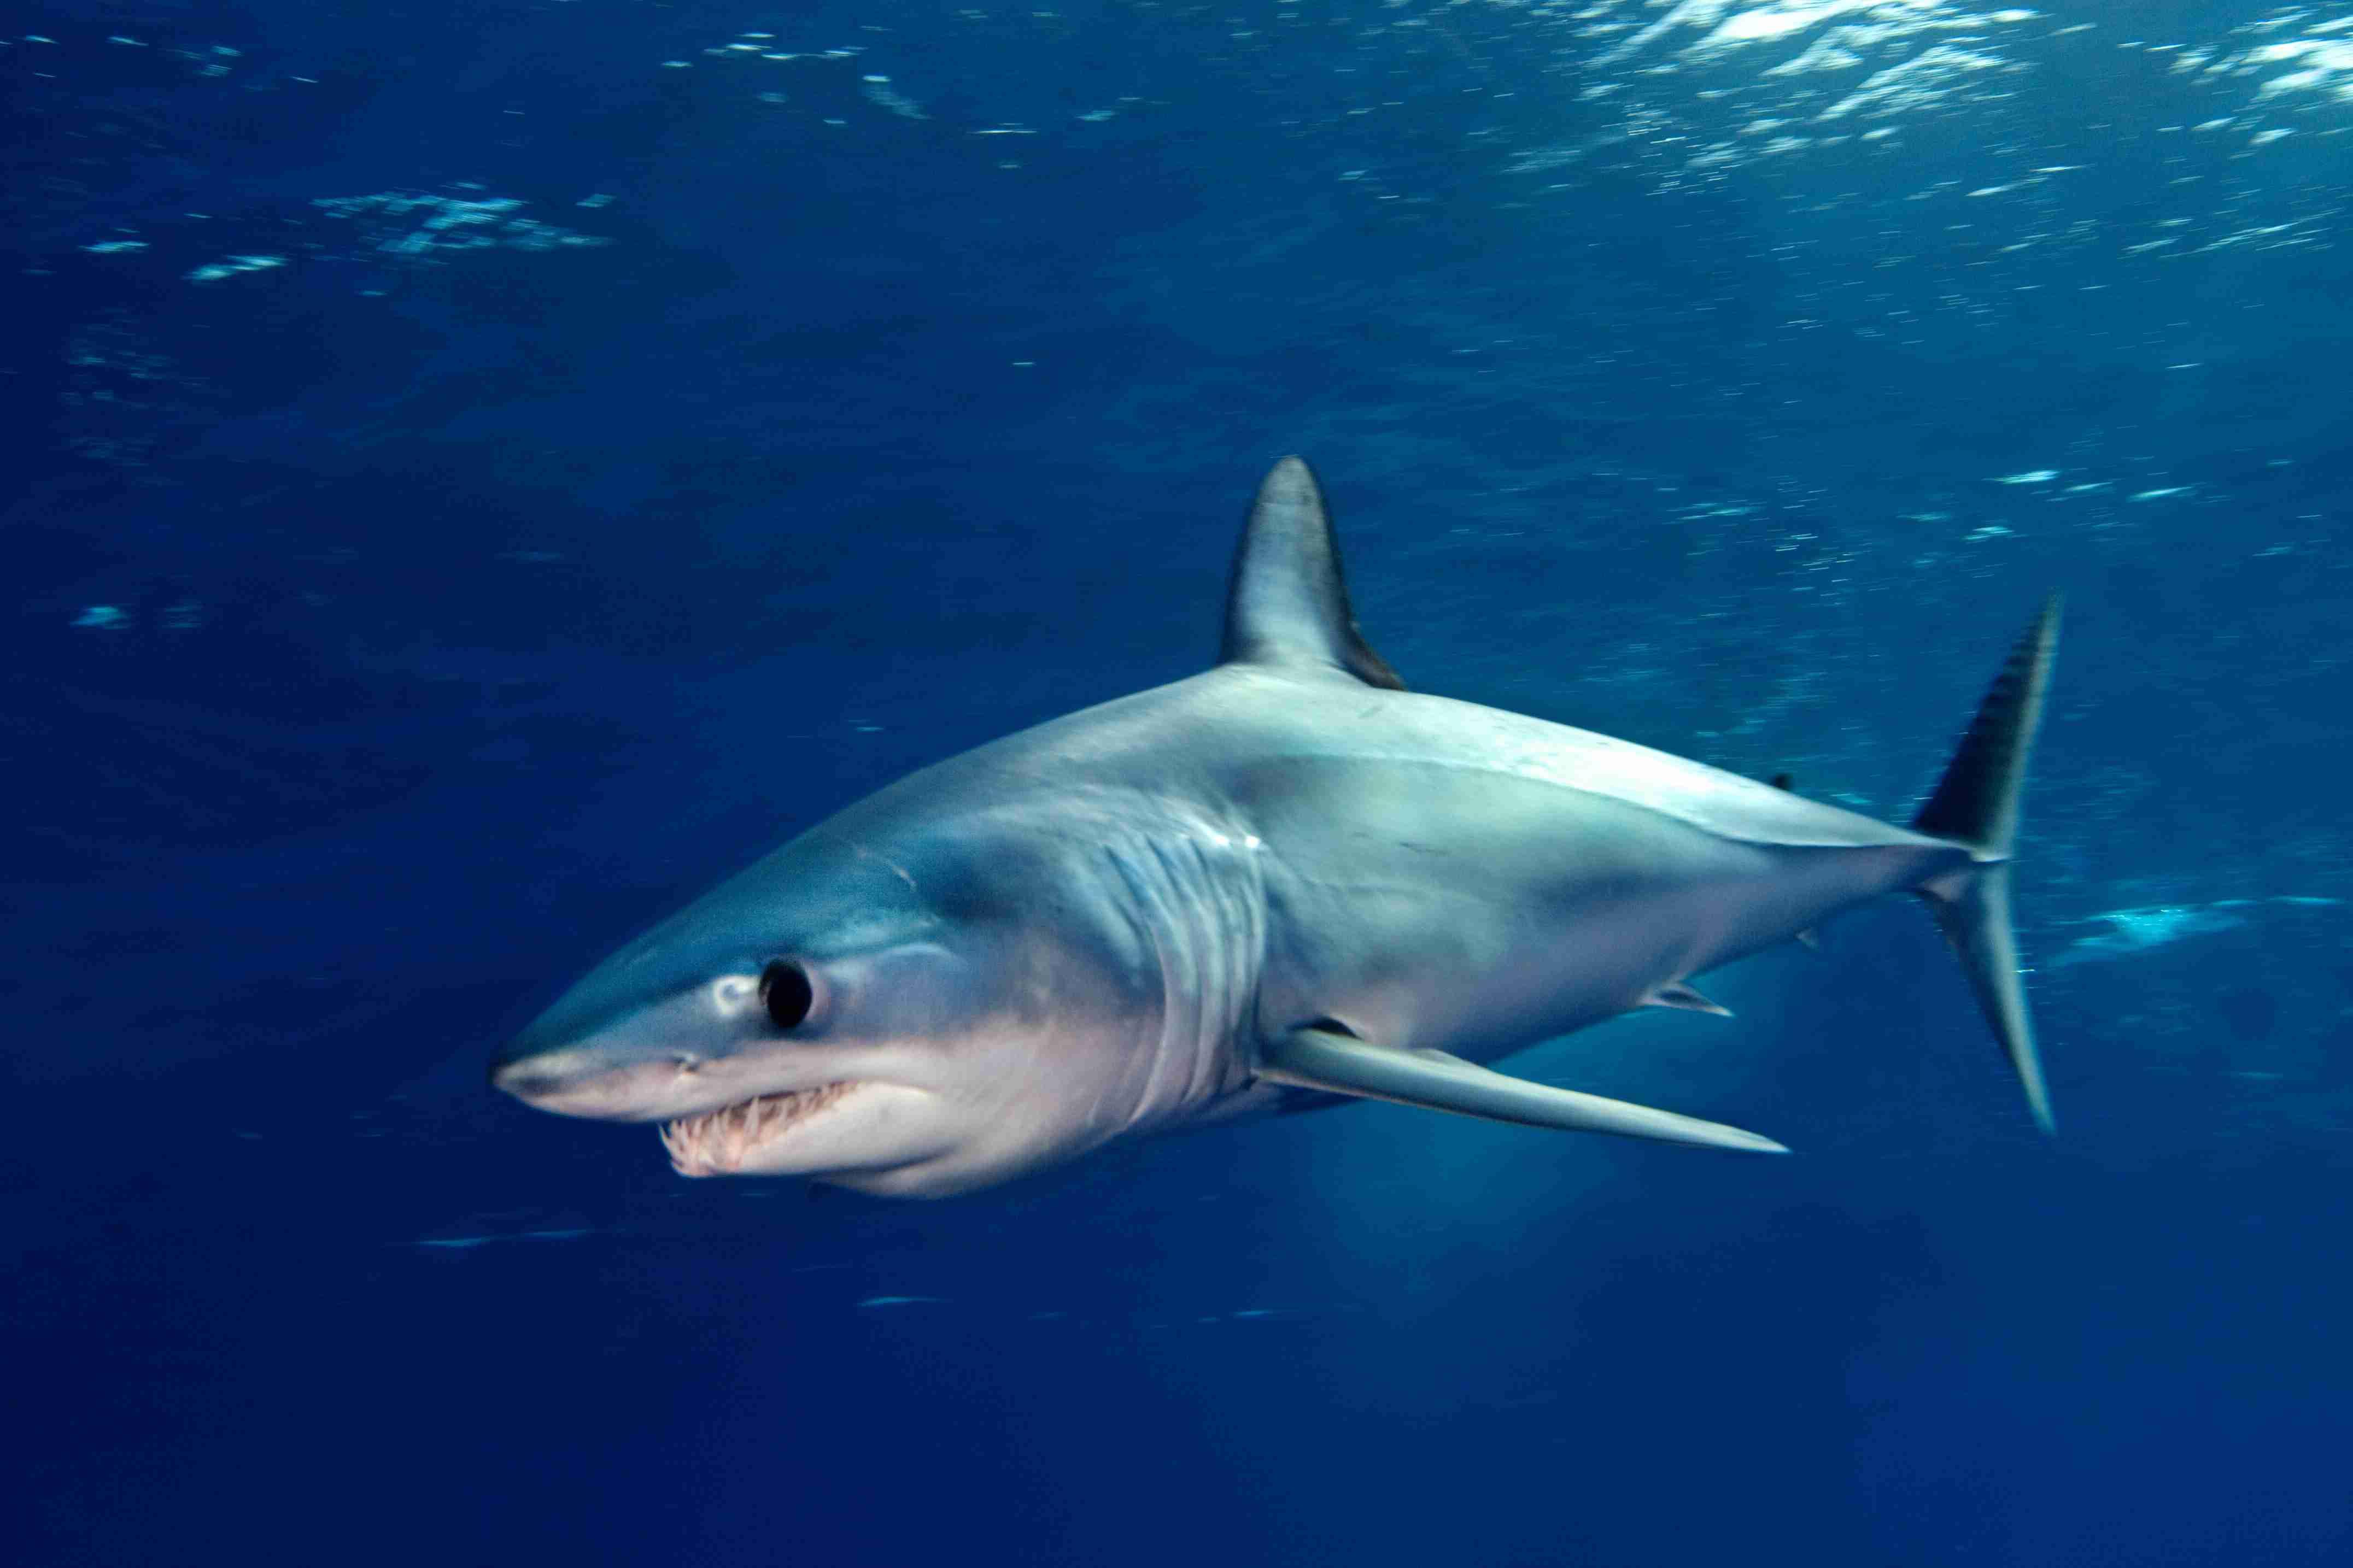 все картинки с акулами достаточно